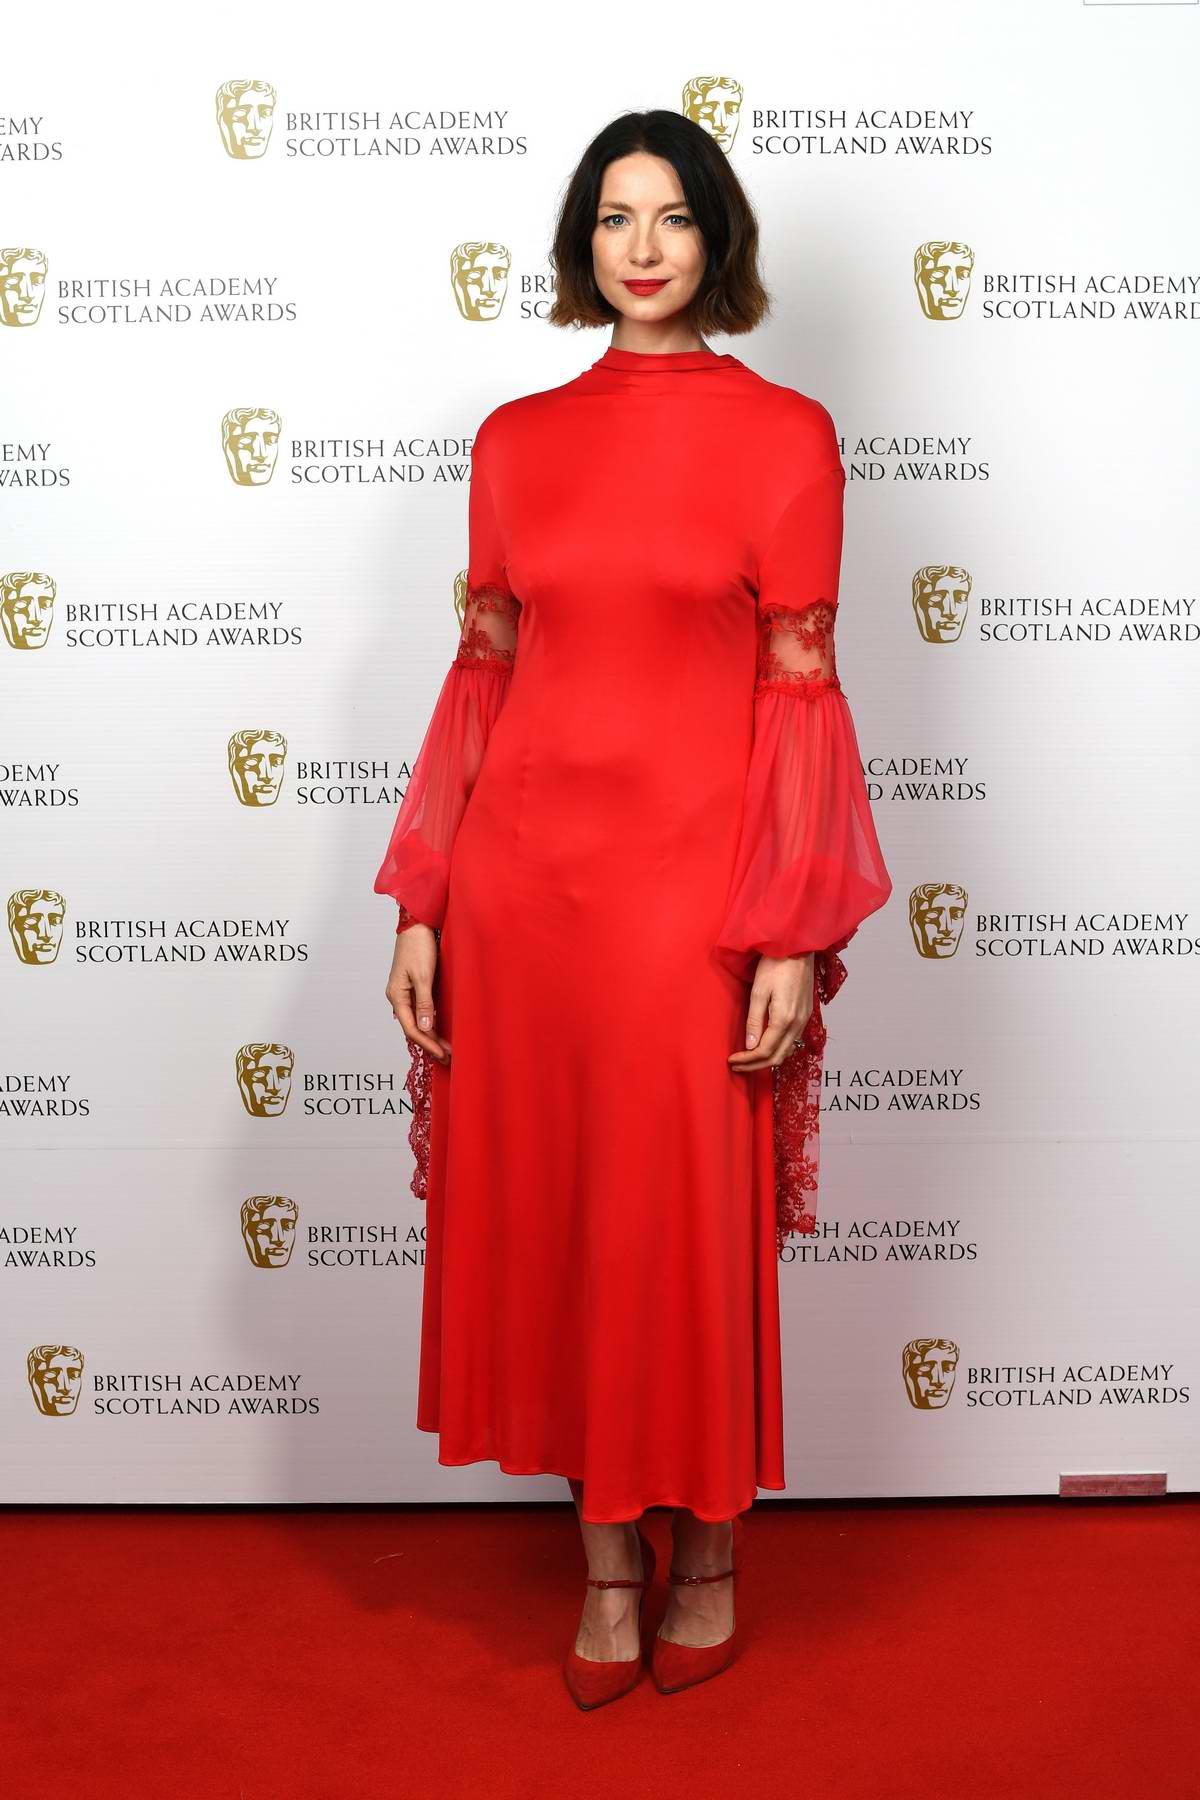 Caitriona Balfe attends the BAFTA Scotland Awards 2019 in Glasgow, Scotland